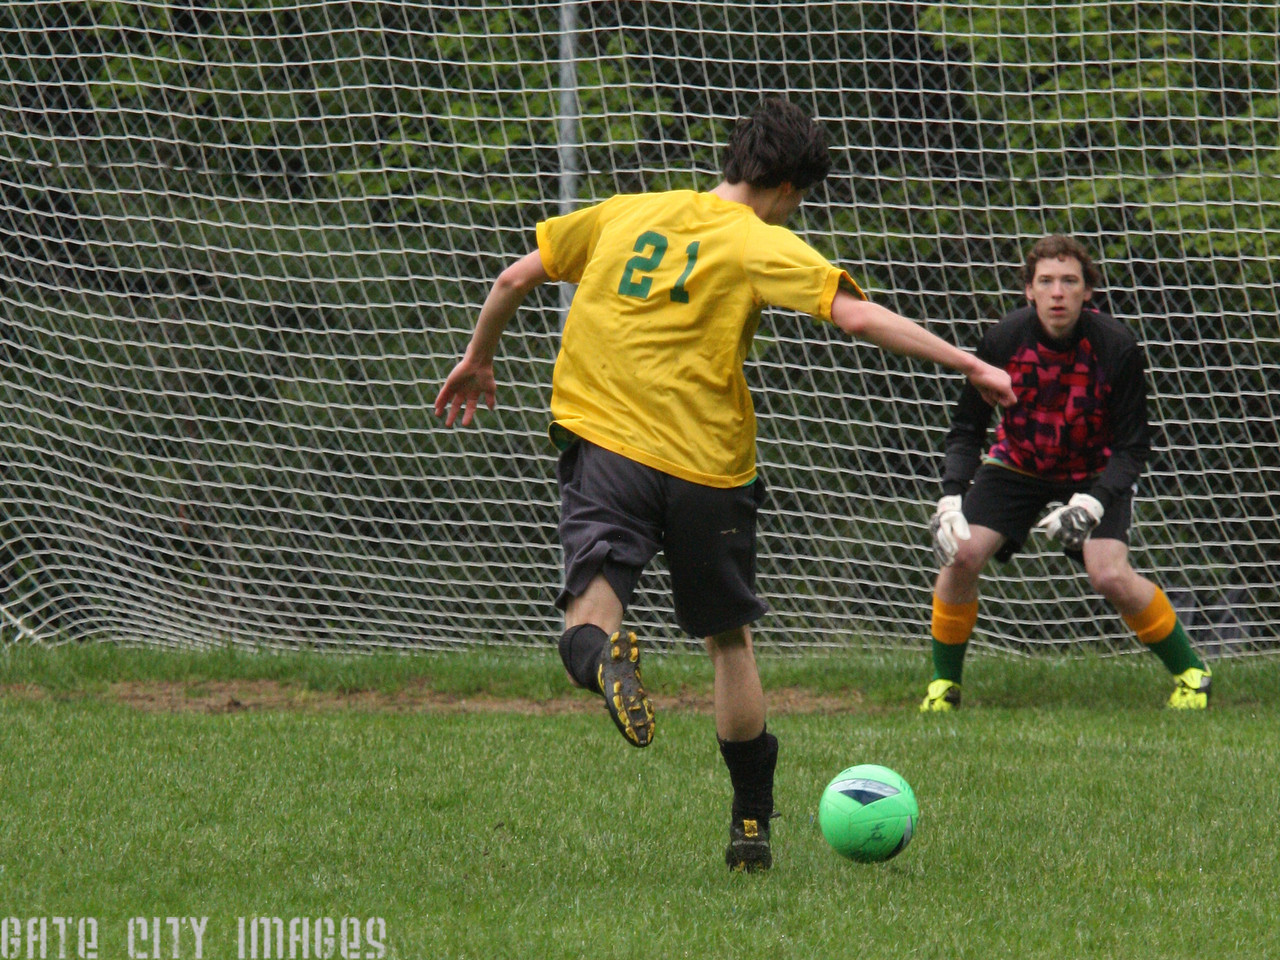 IMG4_42944 Ian rec soccer goal trmzb